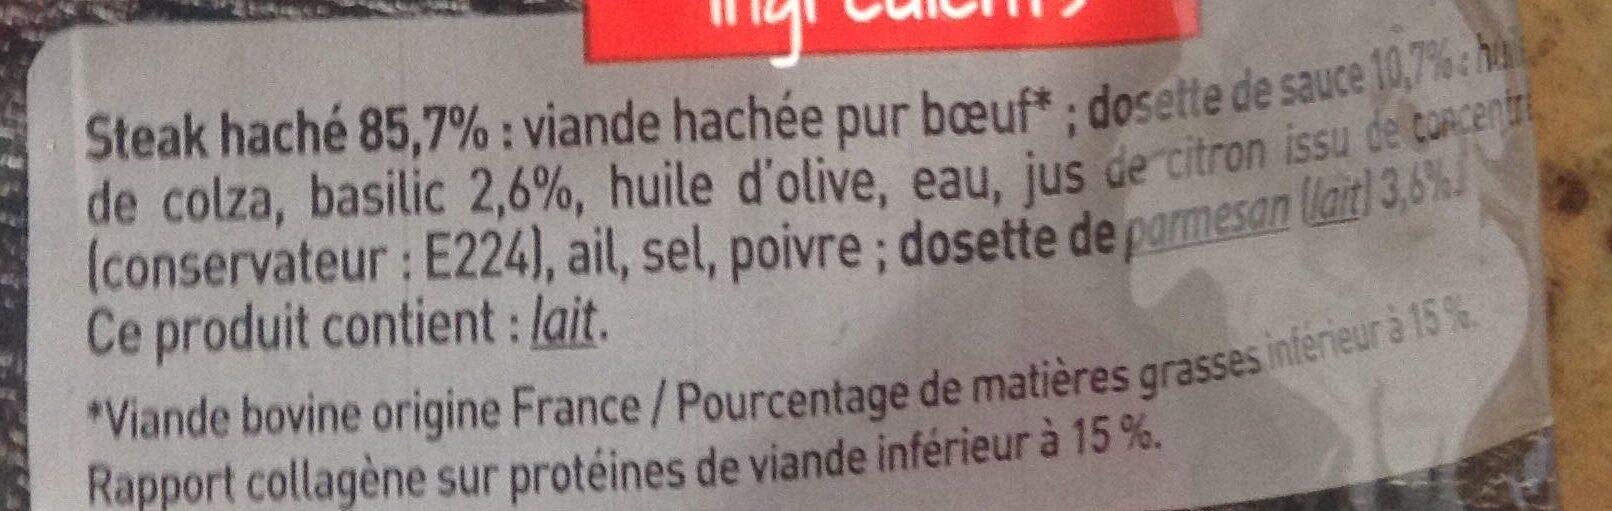 Le haché gourmand - Ingredients